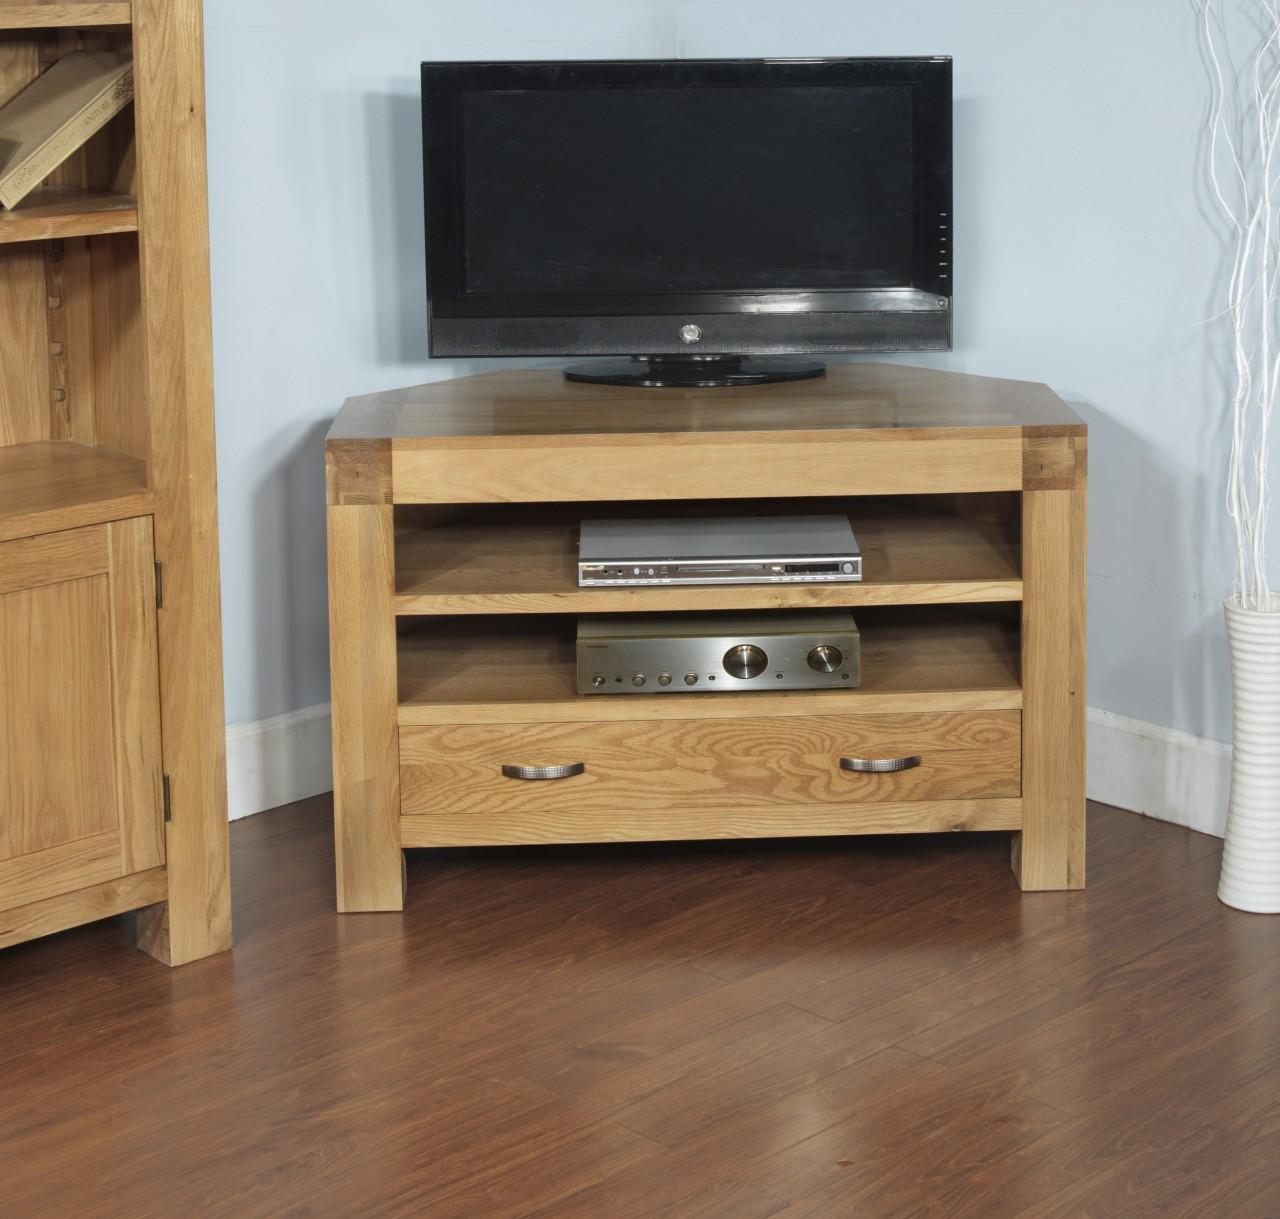 rivermead solid oak modern furniture widescreen corner tv cabinet stand unit ebay. Black Bedroom Furniture Sets. Home Design Ideas